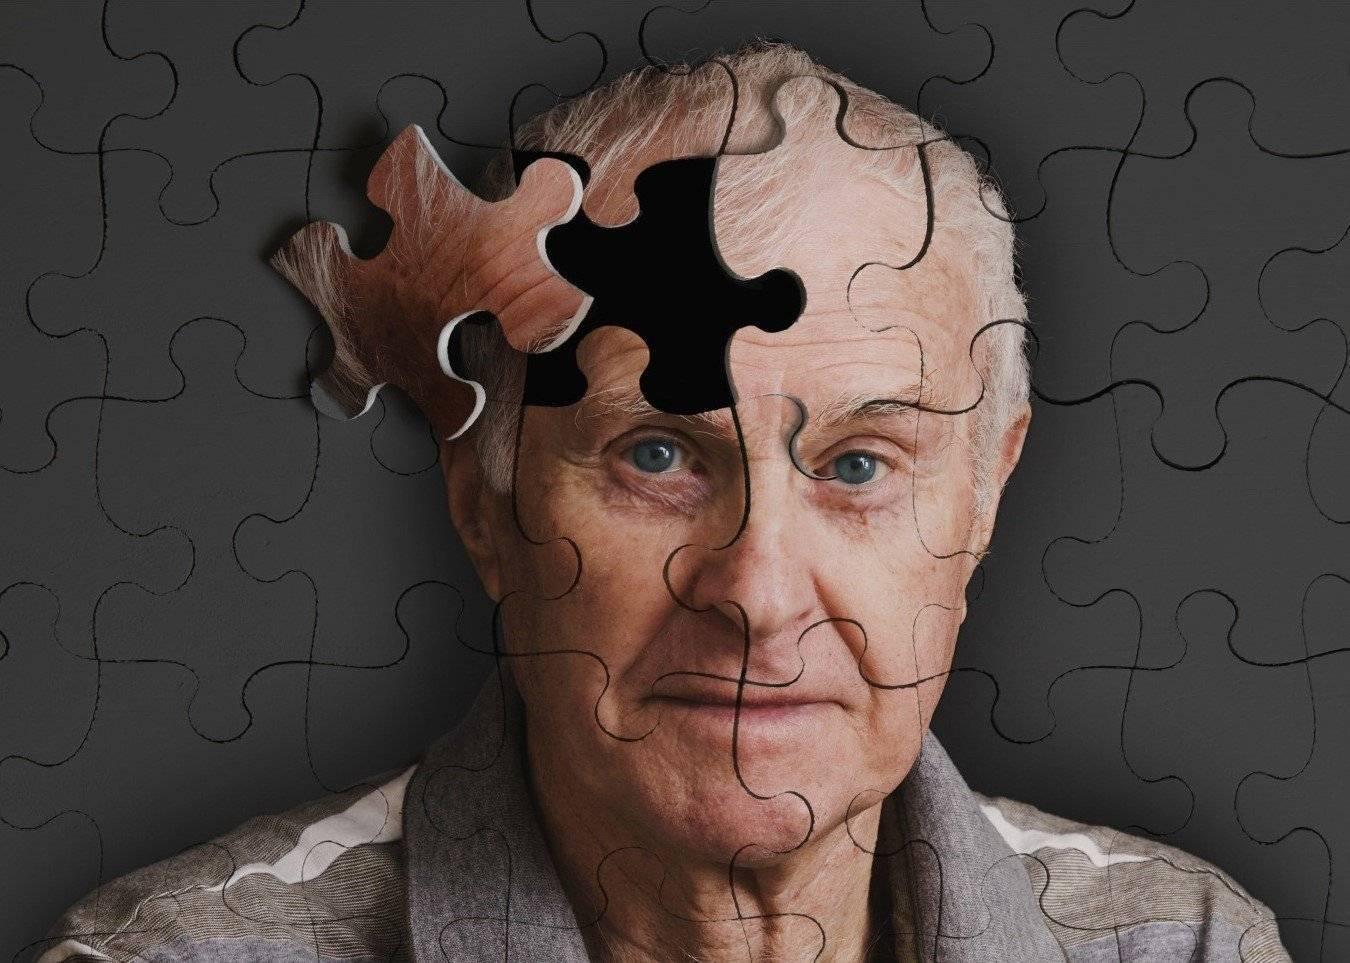 Старческий психоз